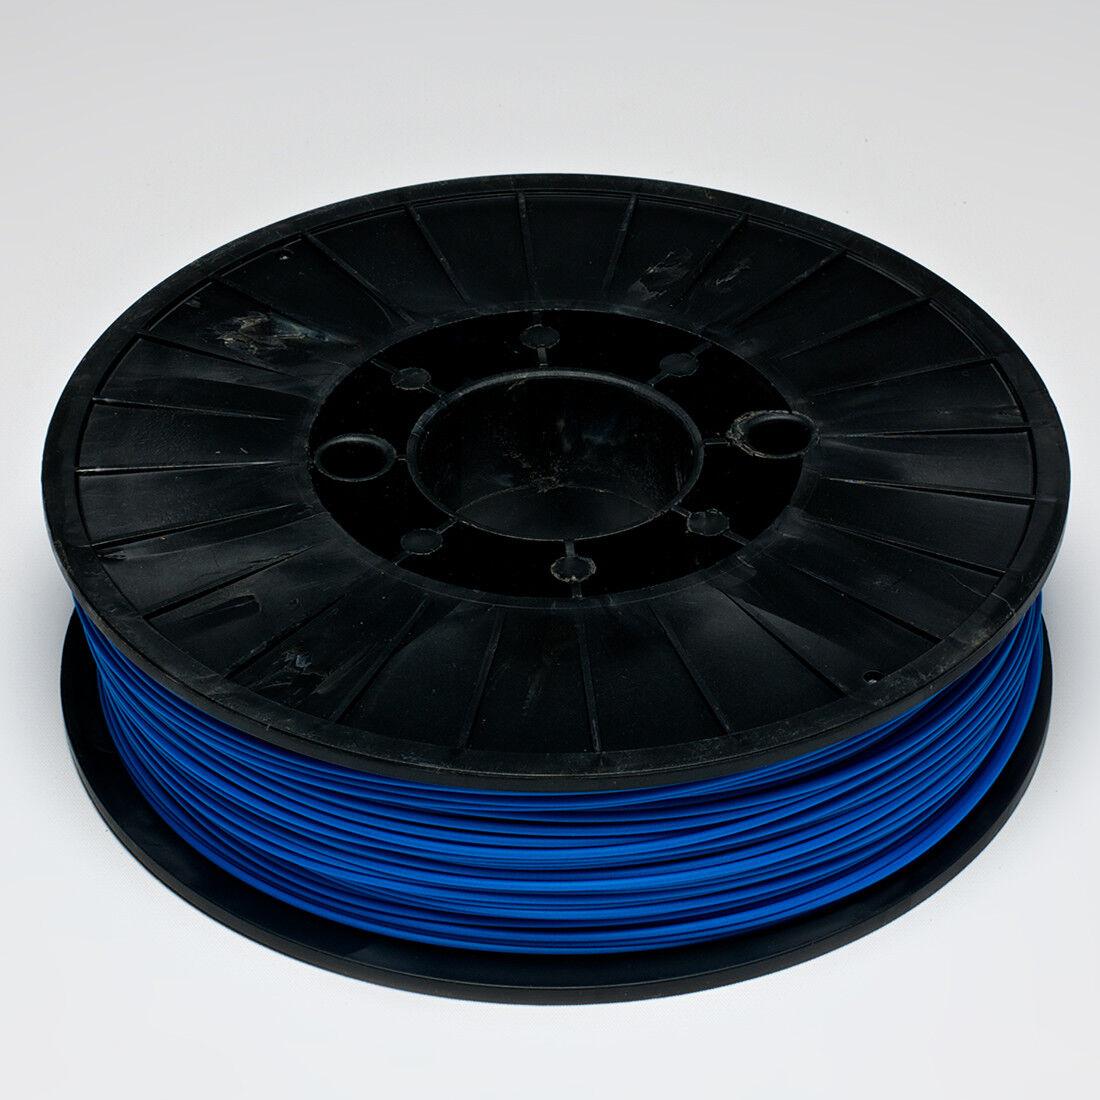 3D Printer Filament Reel Spool 1.75 mm Blue ABS